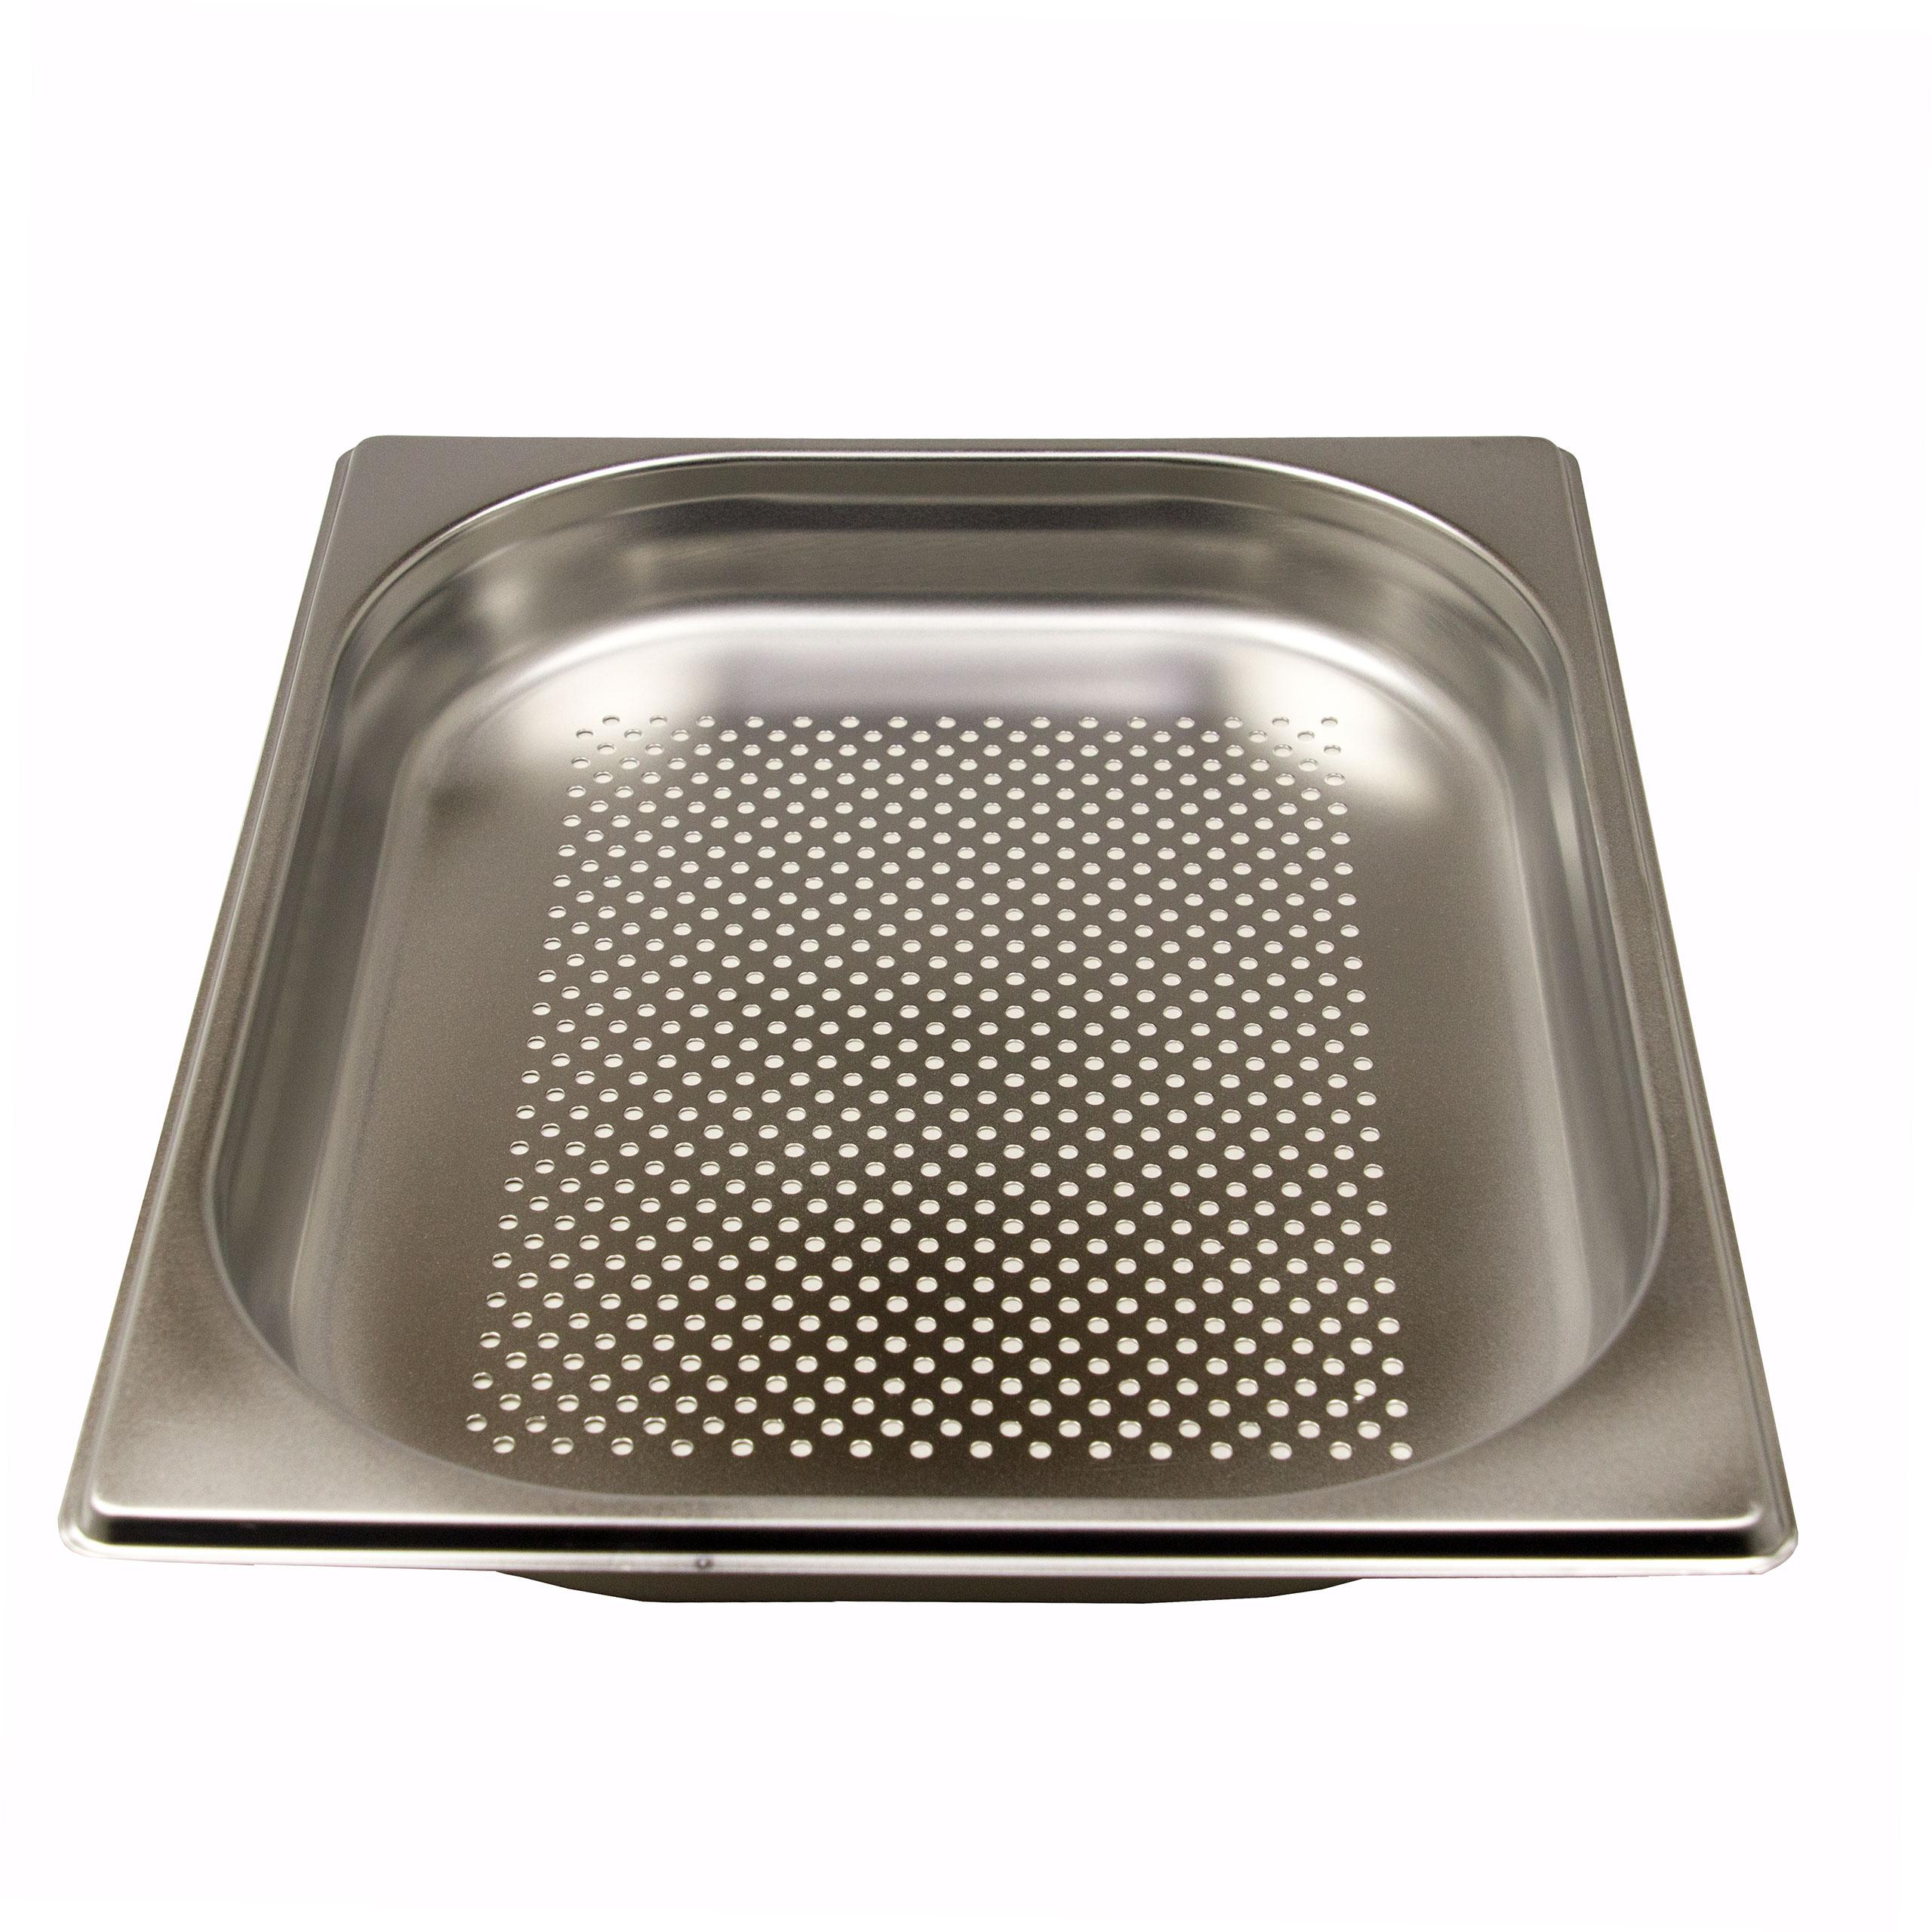 GN 1/3 Gastronormbehälter GN-Behälter Edelstahl 0,75 Liter Tiefe 20mm gelocht